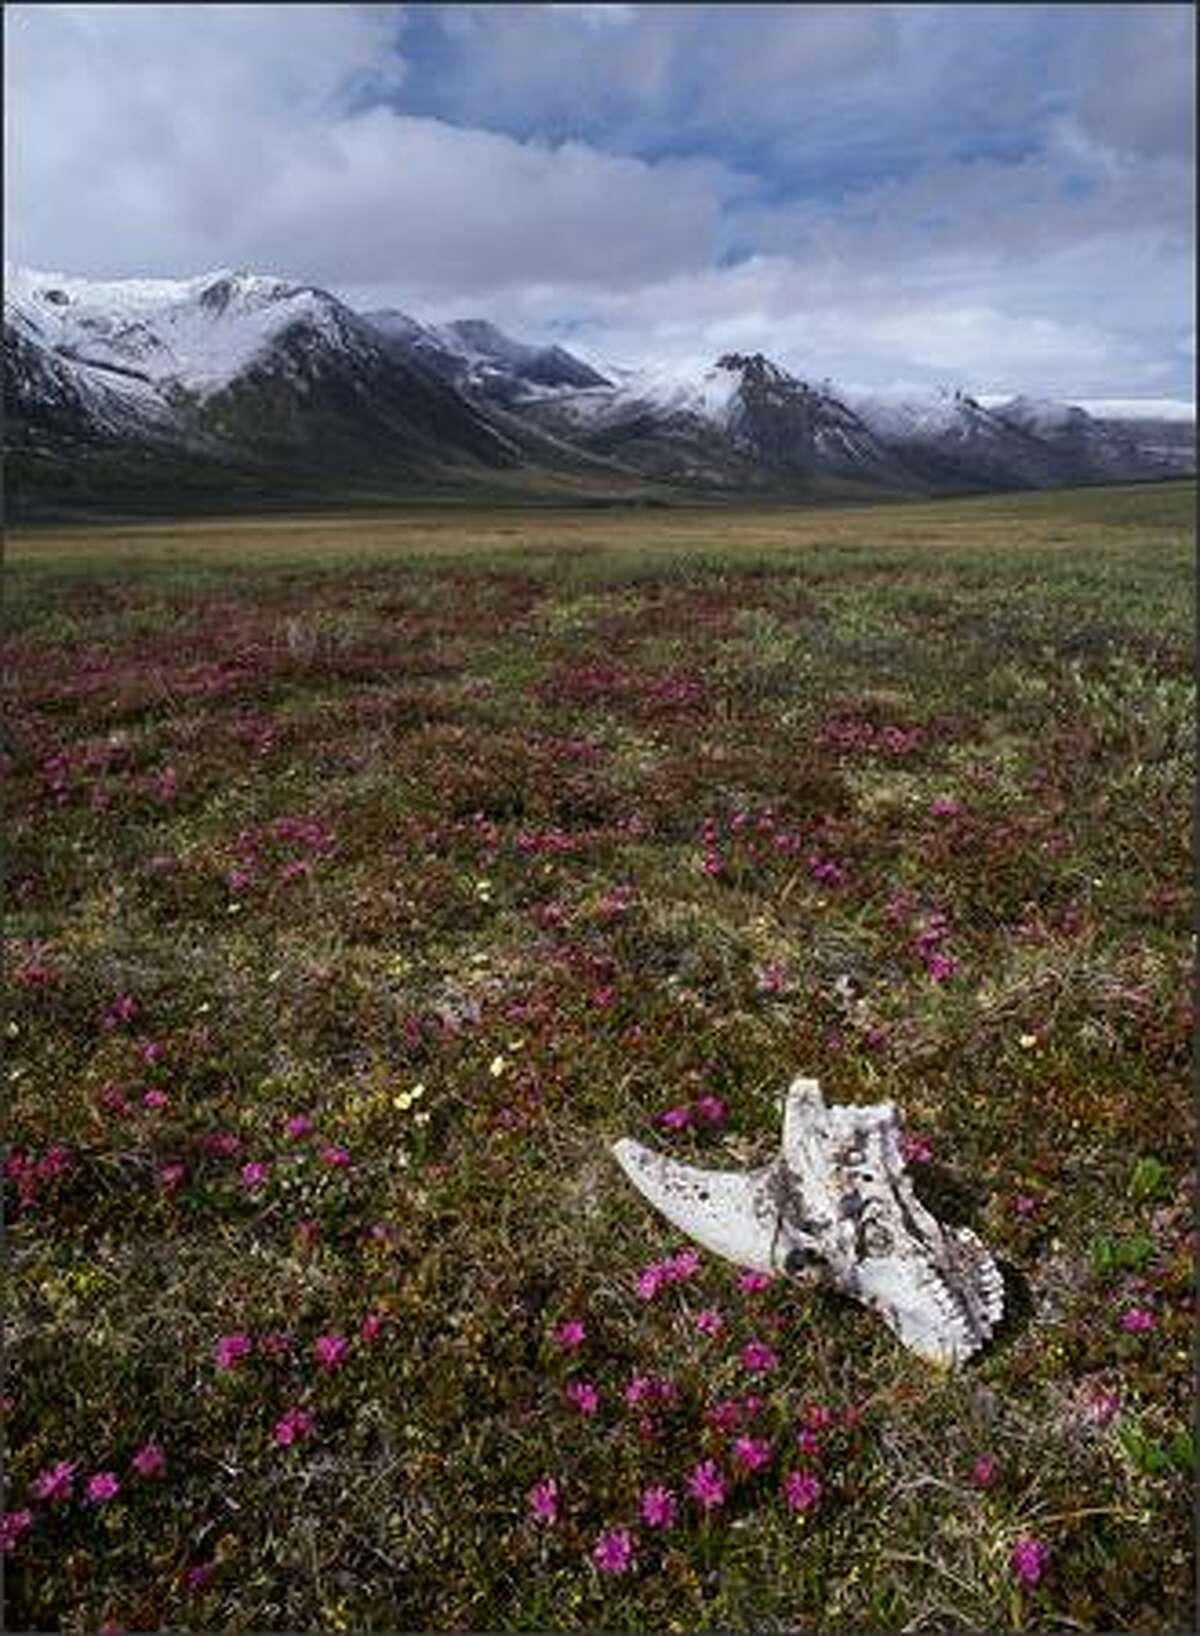 Tundra and wild flowers. (Photo by Subhankar Banerjee, courtesy of Gerald Peters Gallery, Santa Fe/New York)